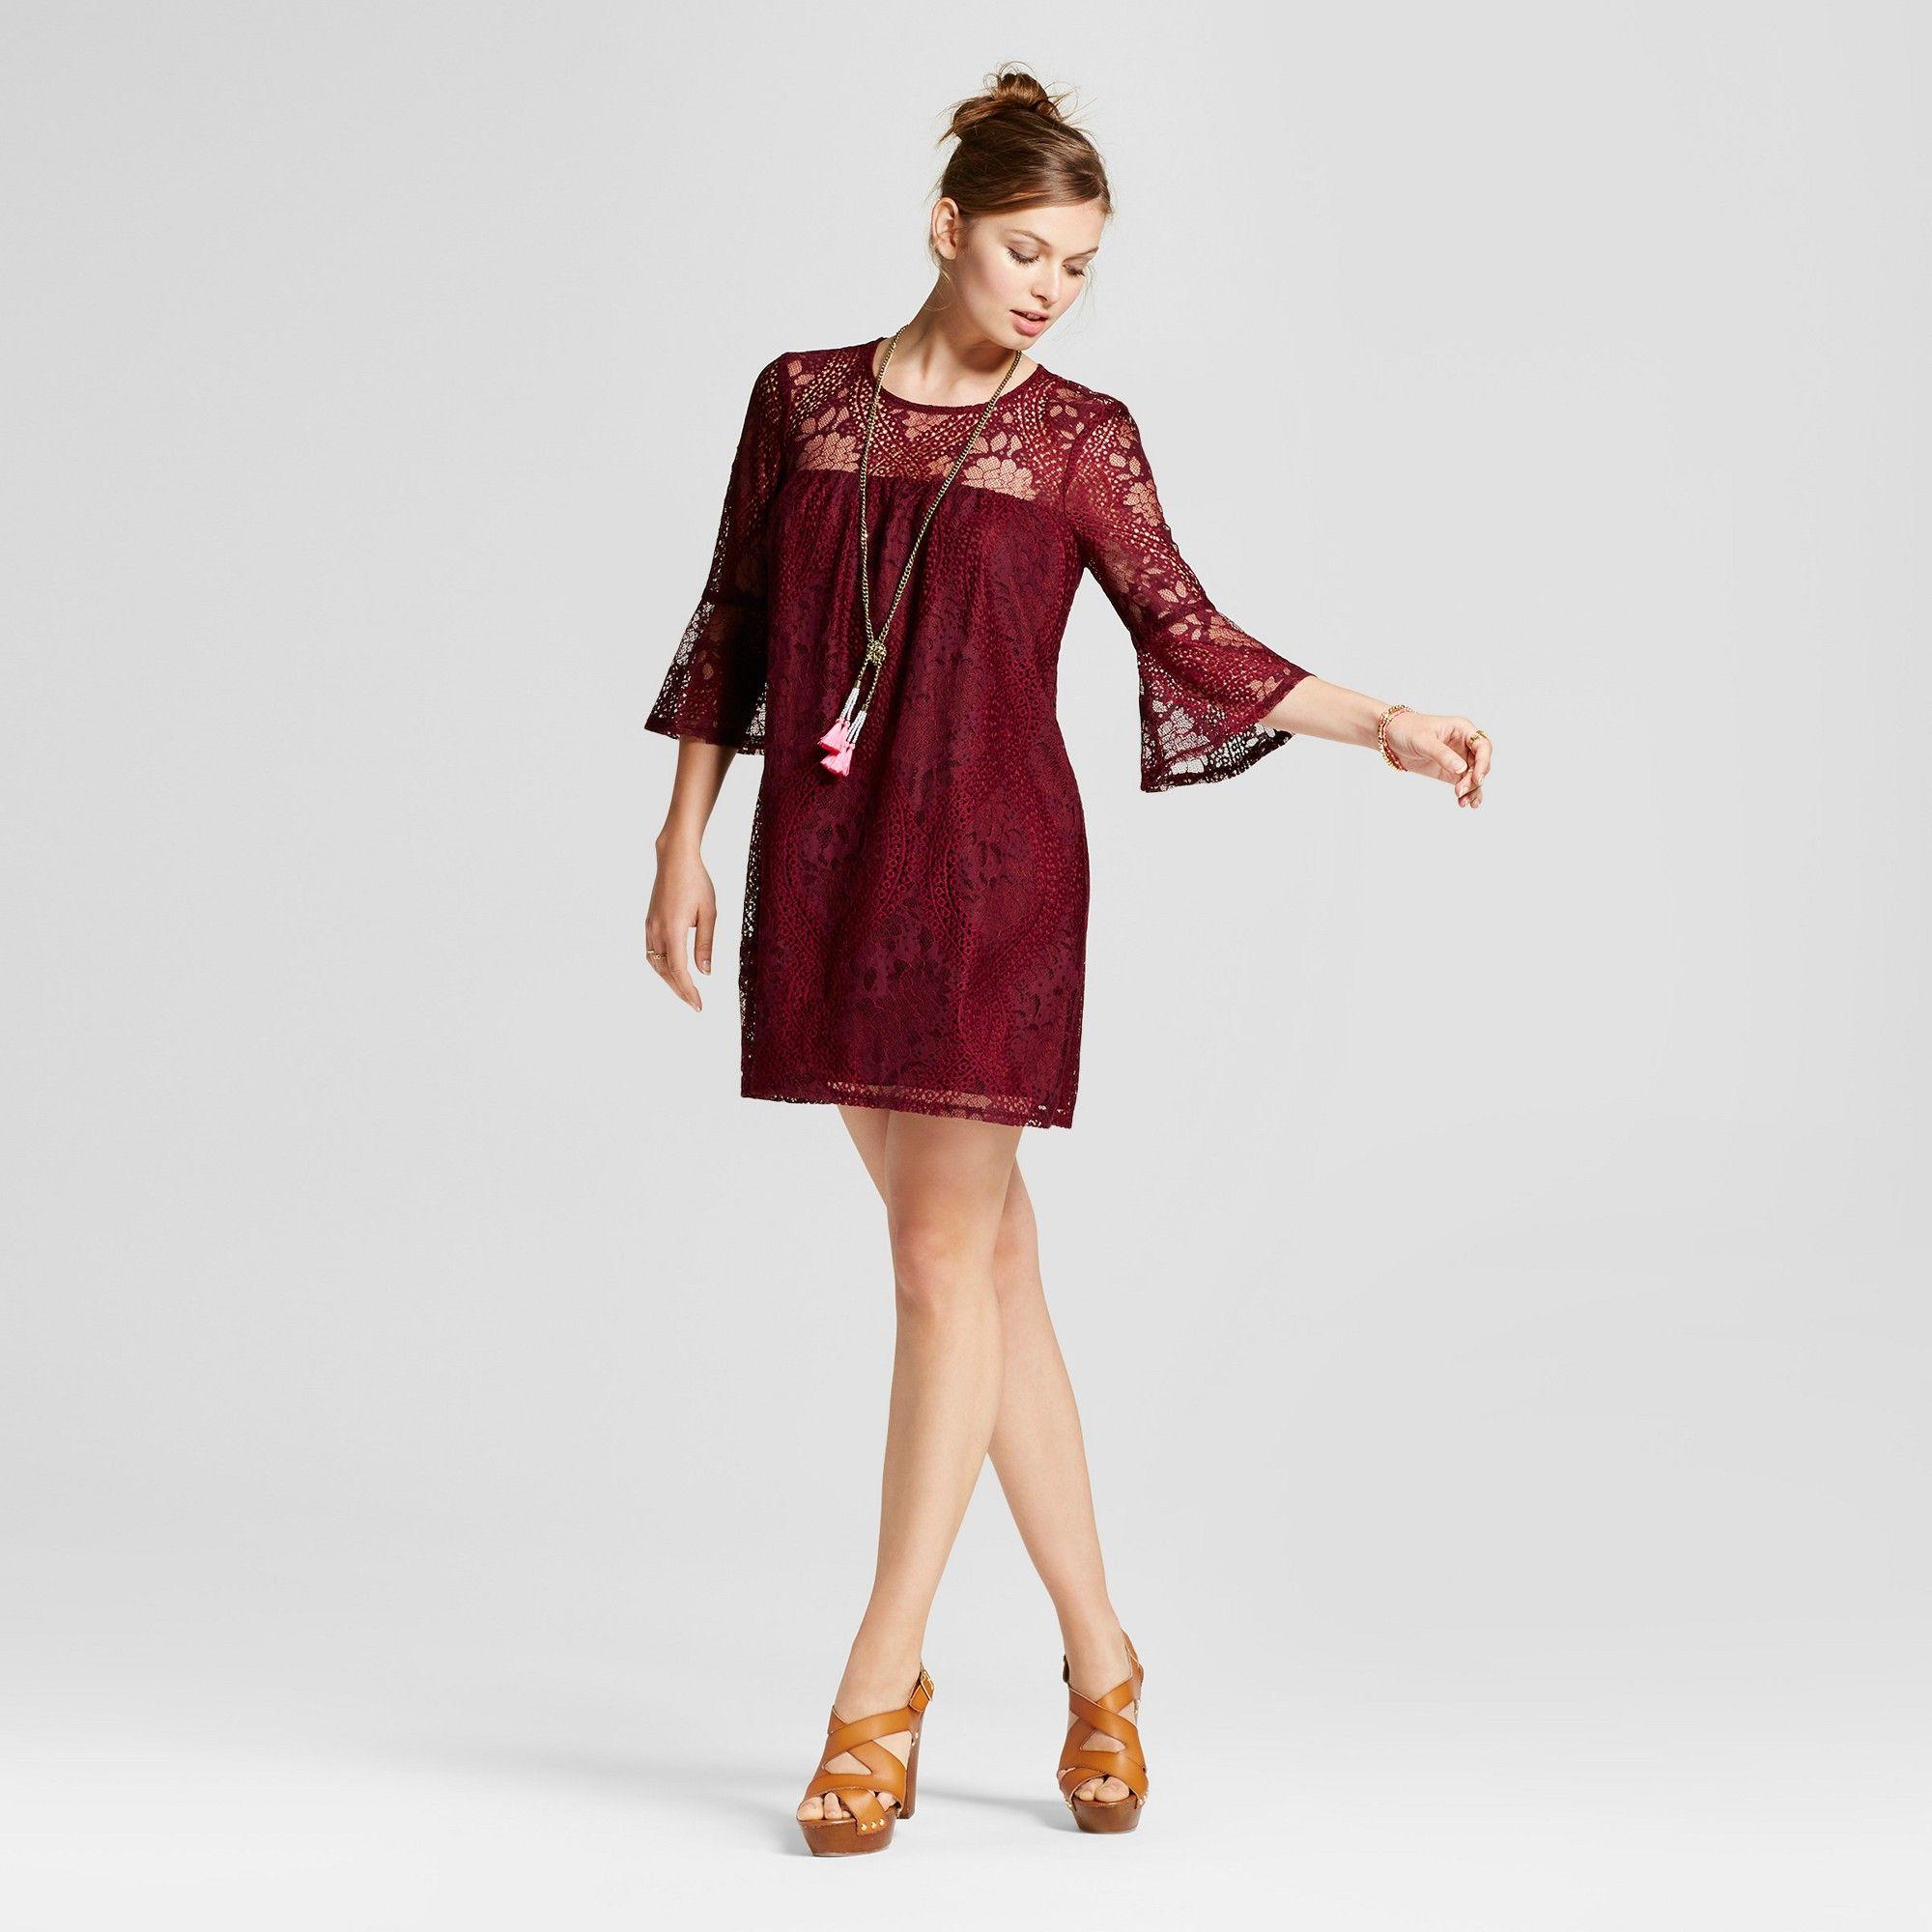 e717ef562ec Women s Lace 3 4 Bell Sleeve Shift Dress - Lots of Love by Speechless ( Juniors ) Burgundy XS